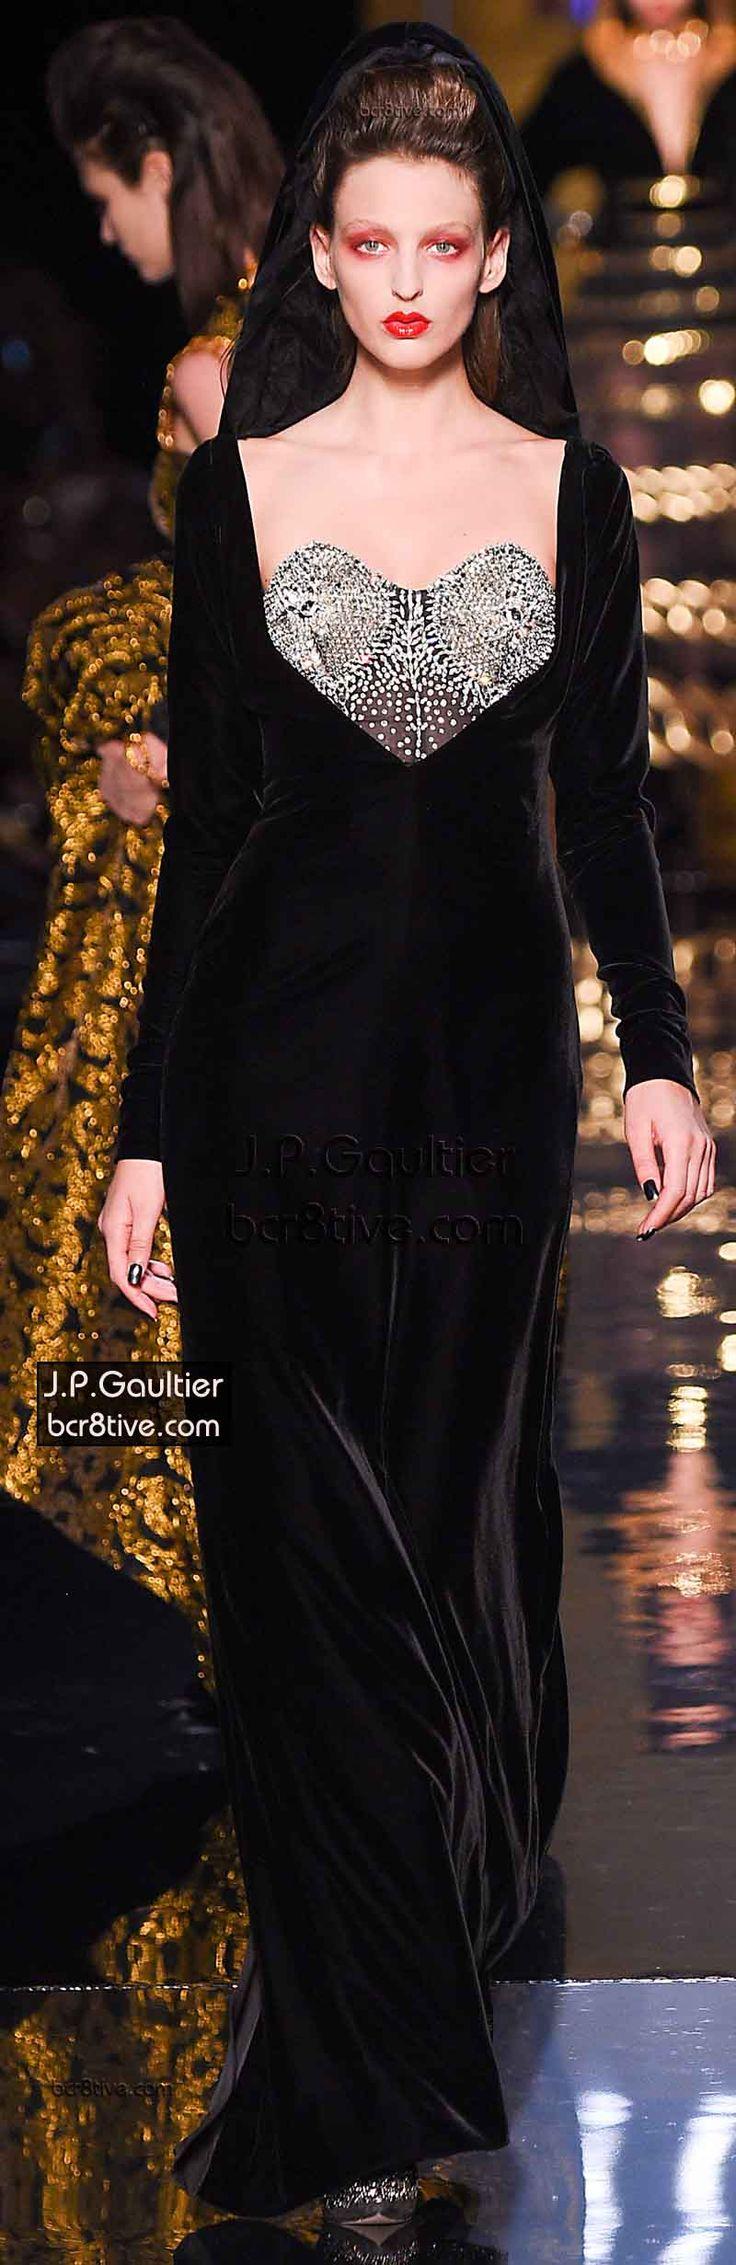 Jean Paul Gaultier Fall Winter 2014-15 Haute Couture